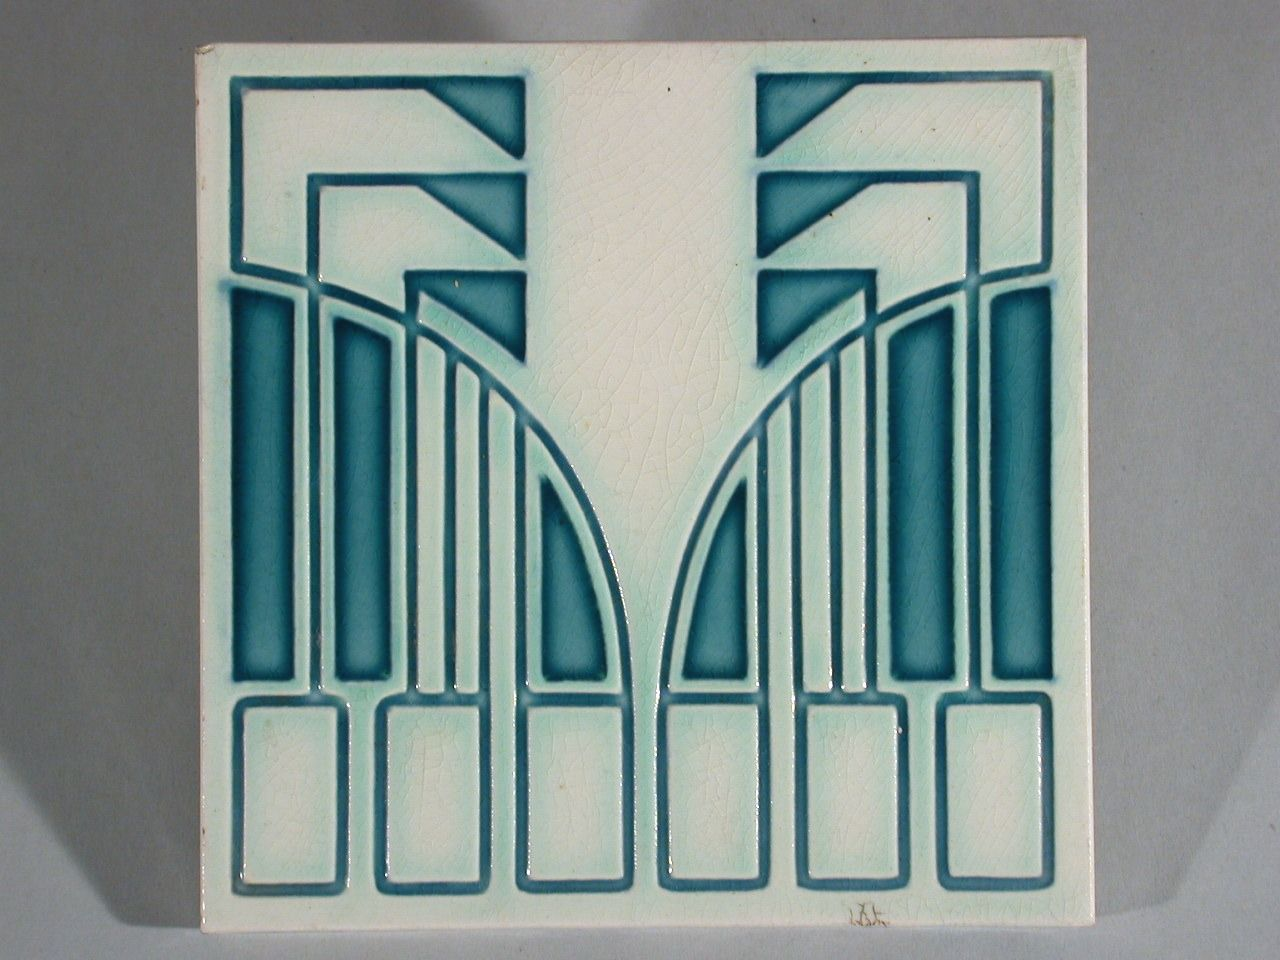 Art nouveau tile mettlach peter behrens azulejo tiles kachel art nouveau tile mettlach peter behrens dailygadgetfo Images